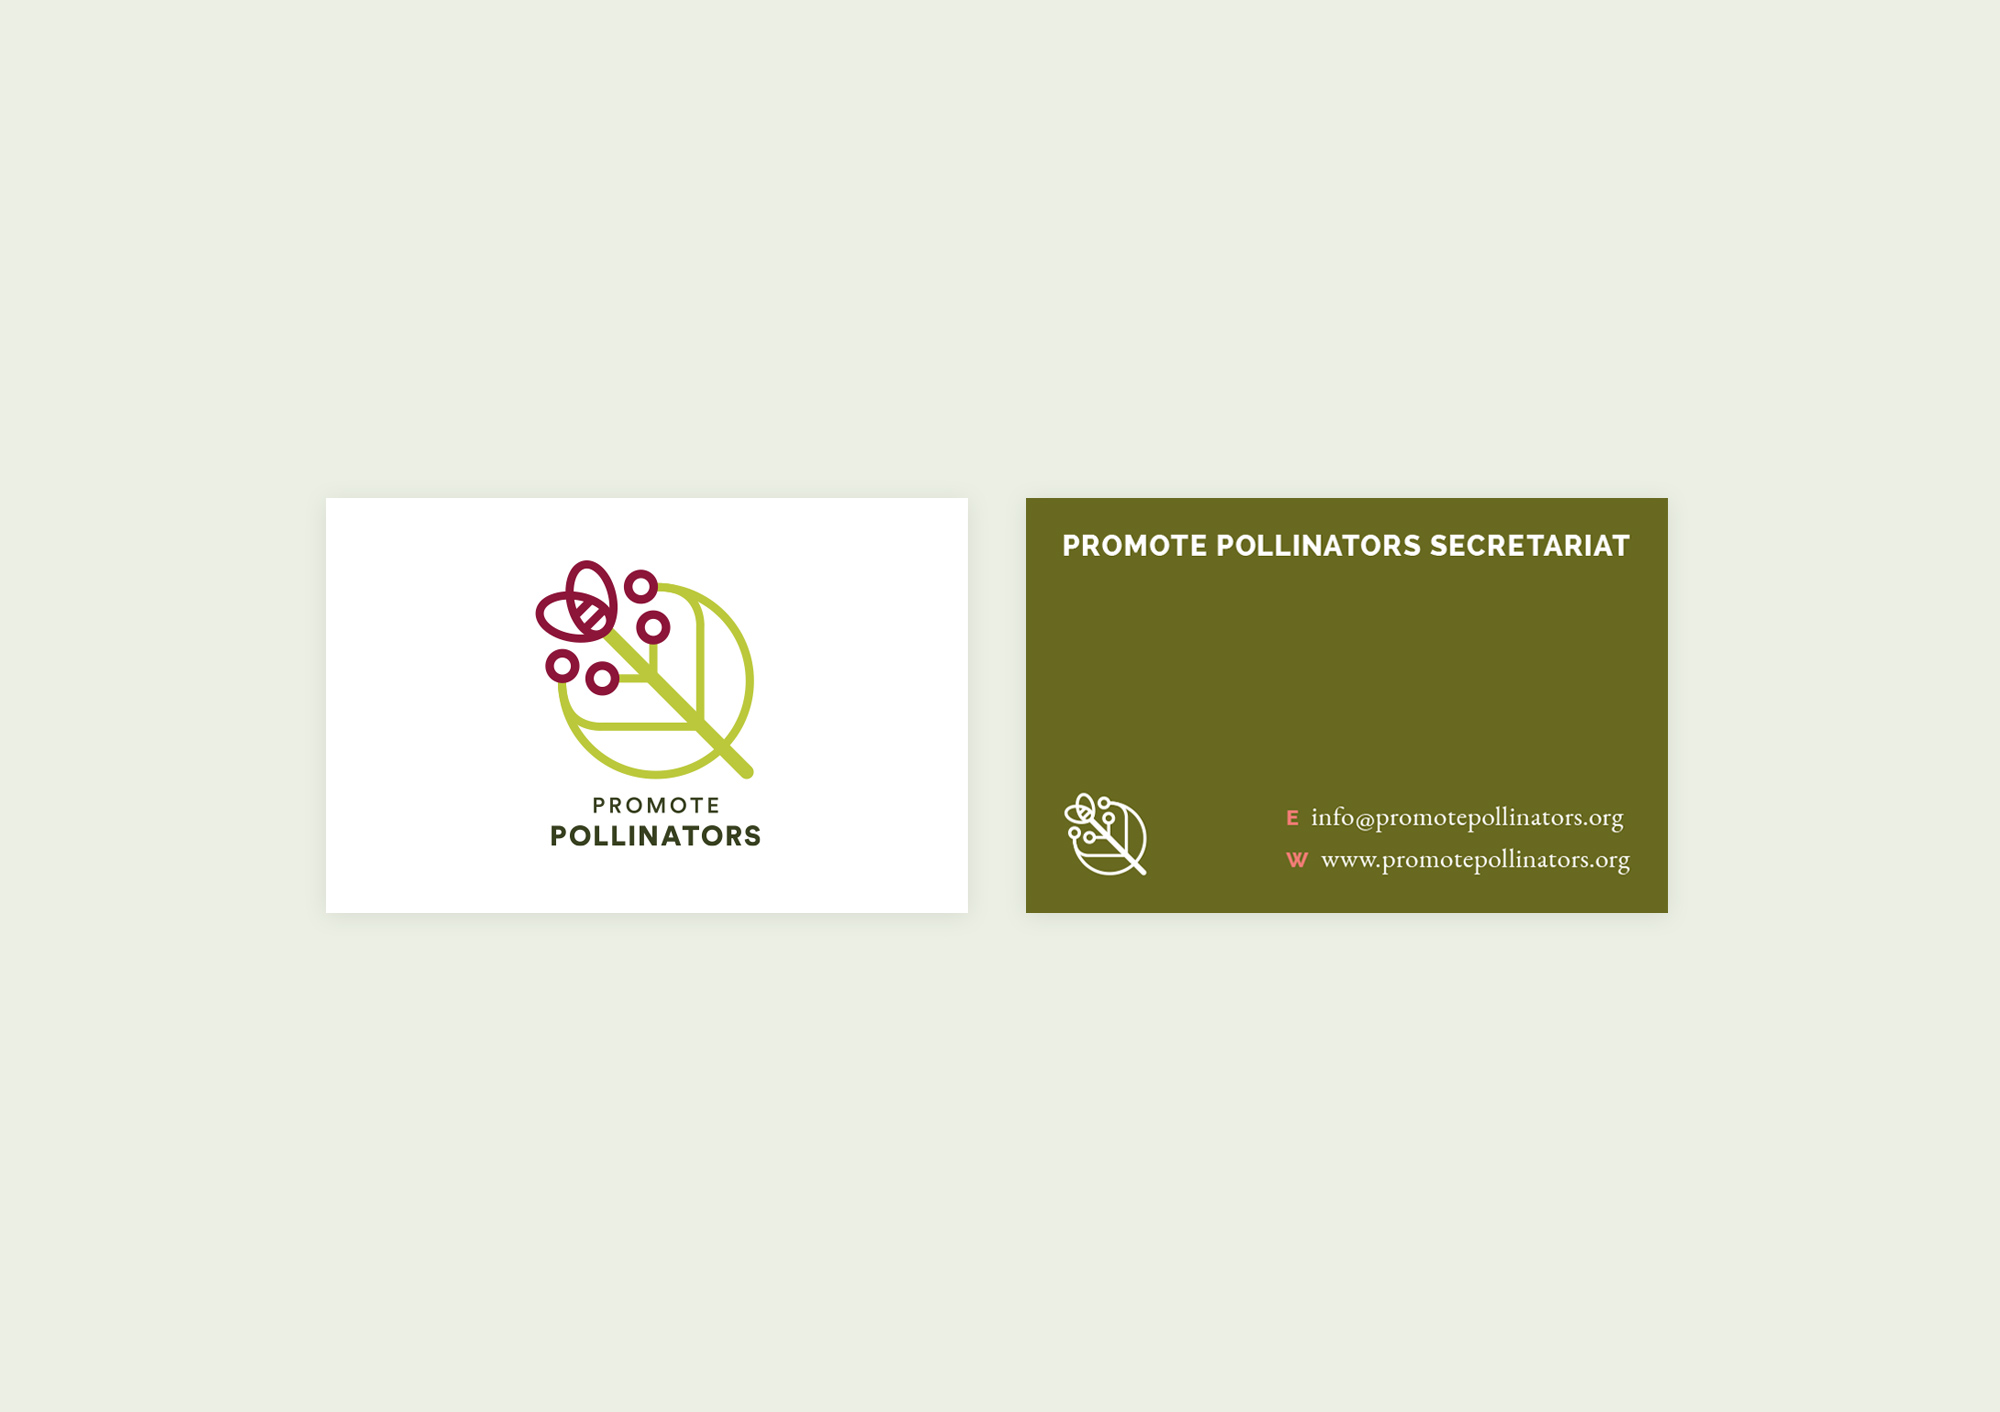 Design Business Cards for Promote Pollinators